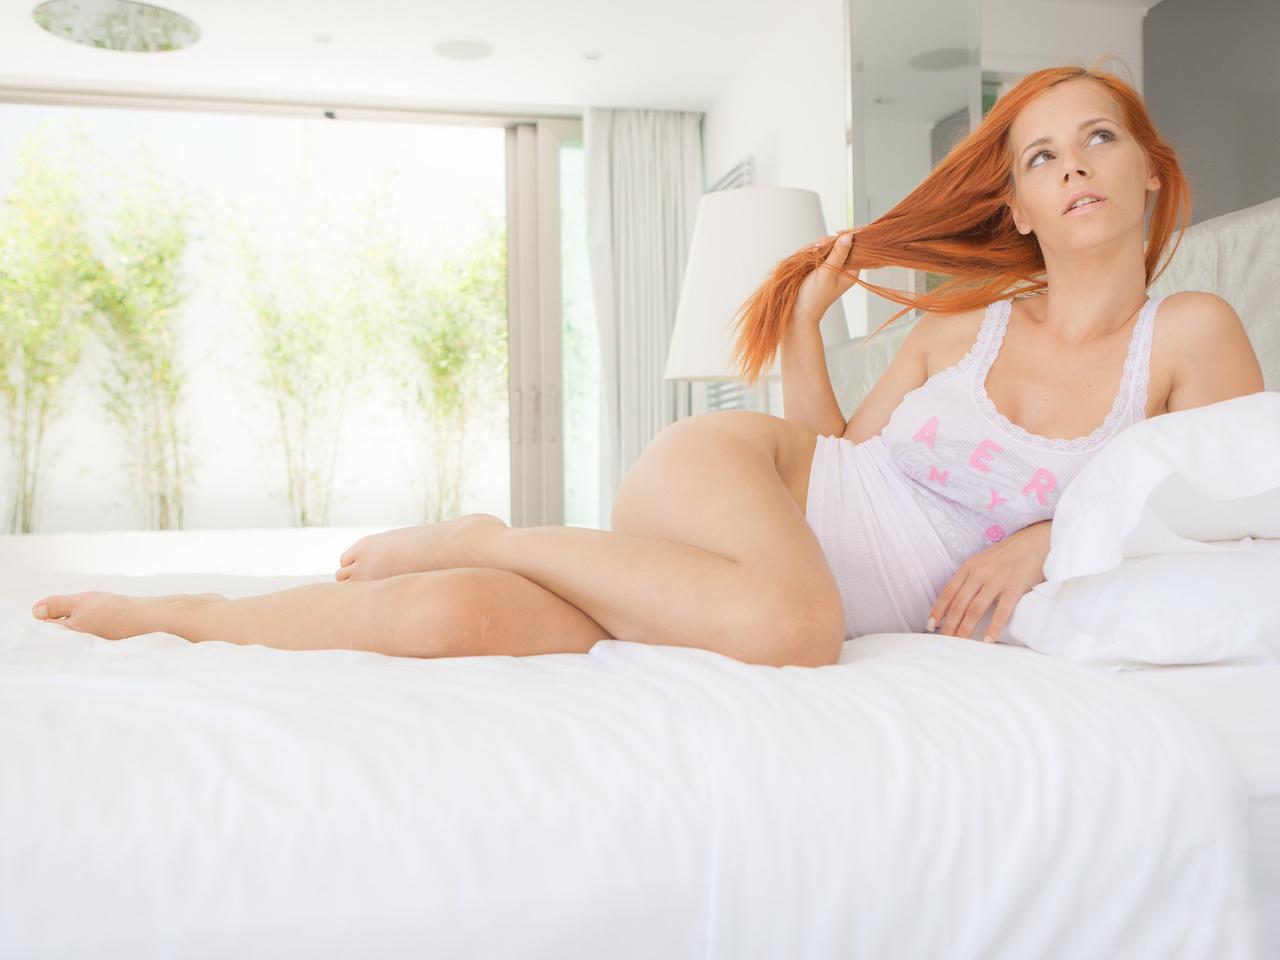 erotica, pussy, большая грудь, sexy, Ariel piper fawn, рыжая, nude, девушка